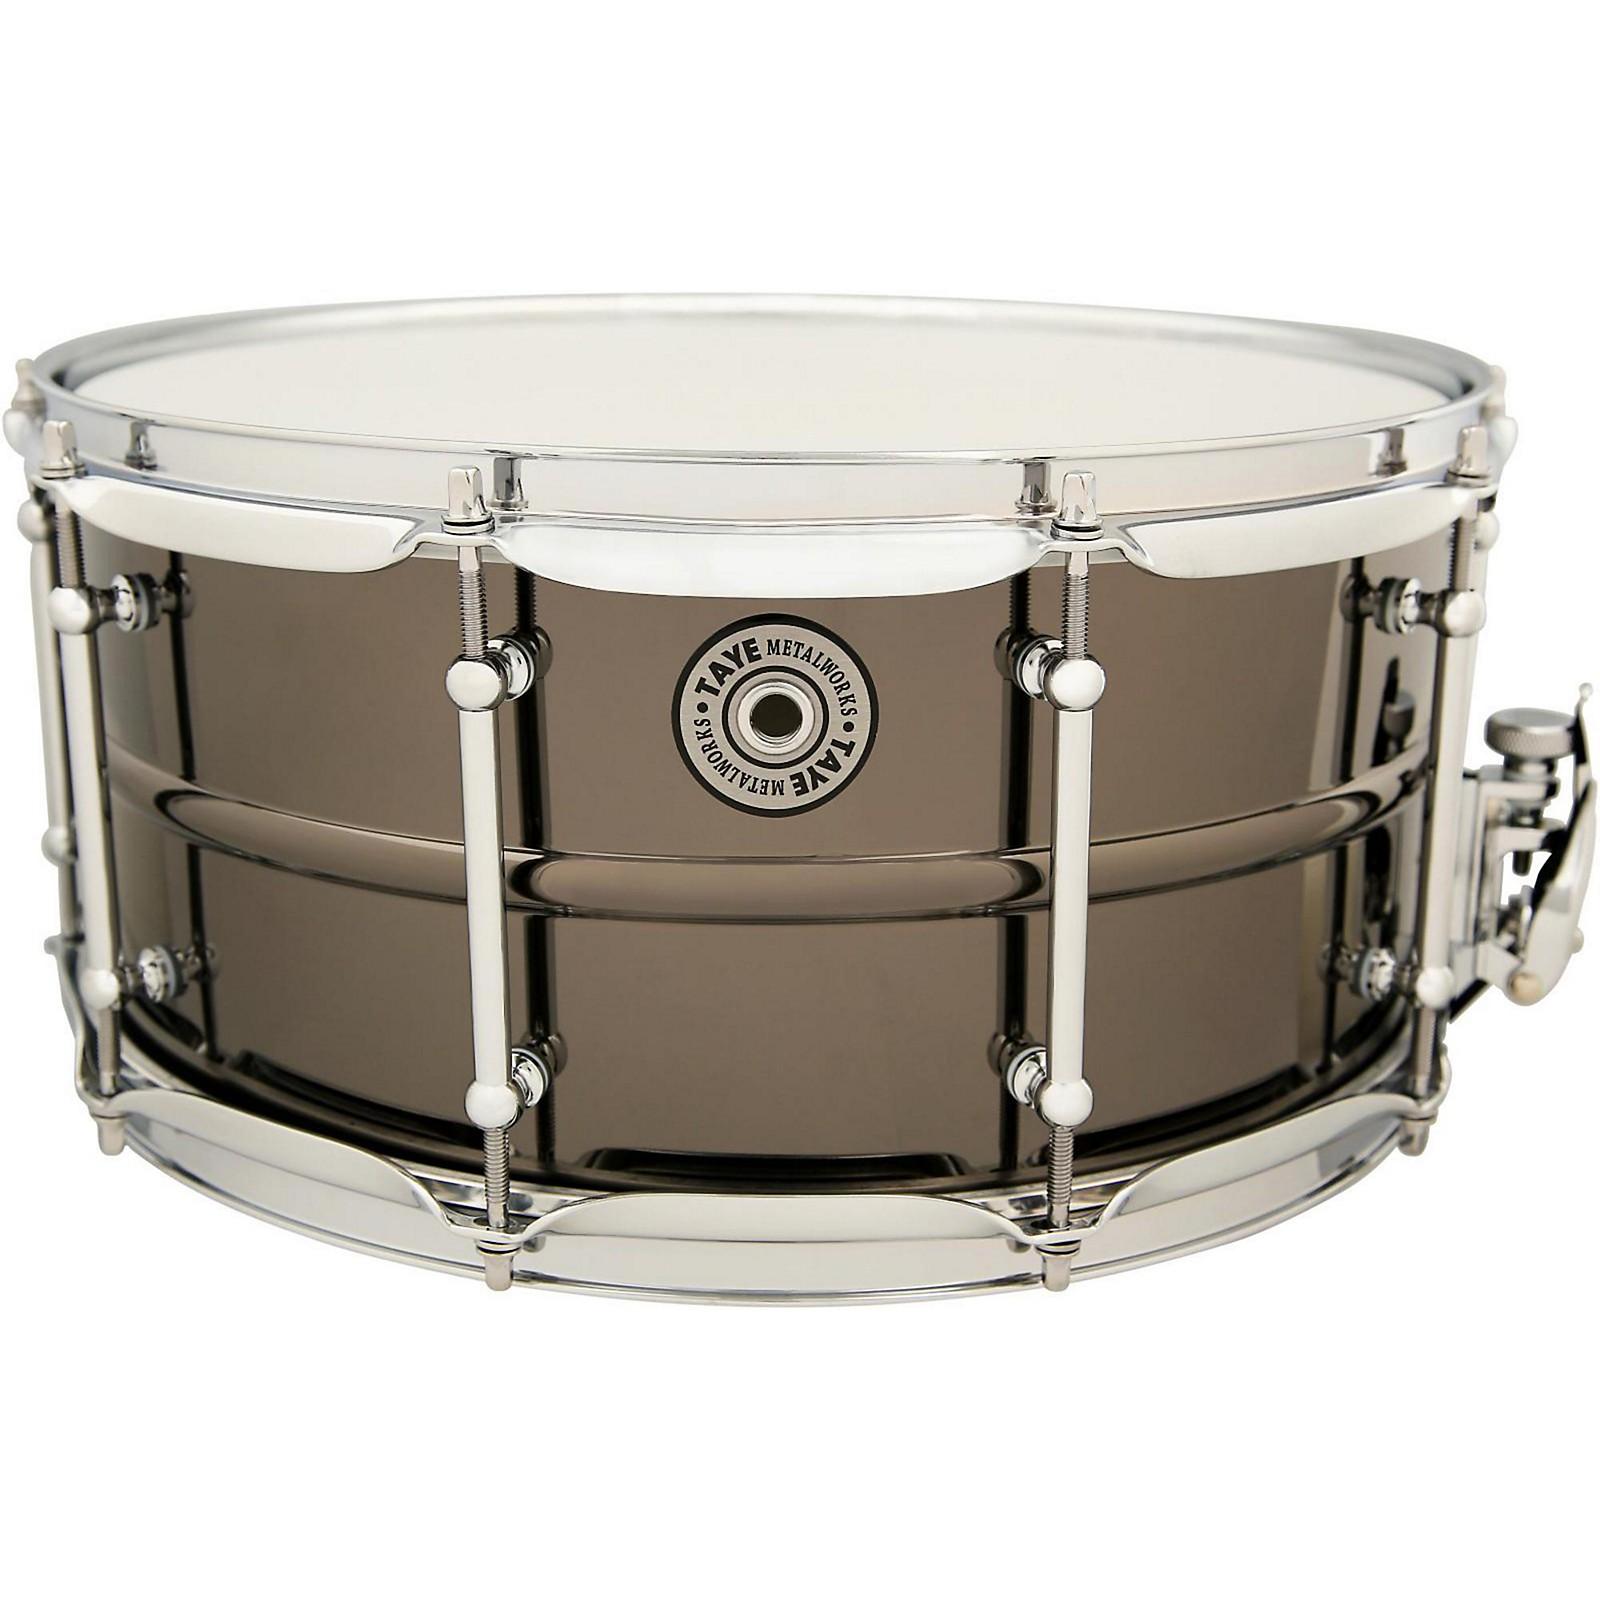 Open Box Taye Drums Metalworks Vintage Brass Snare